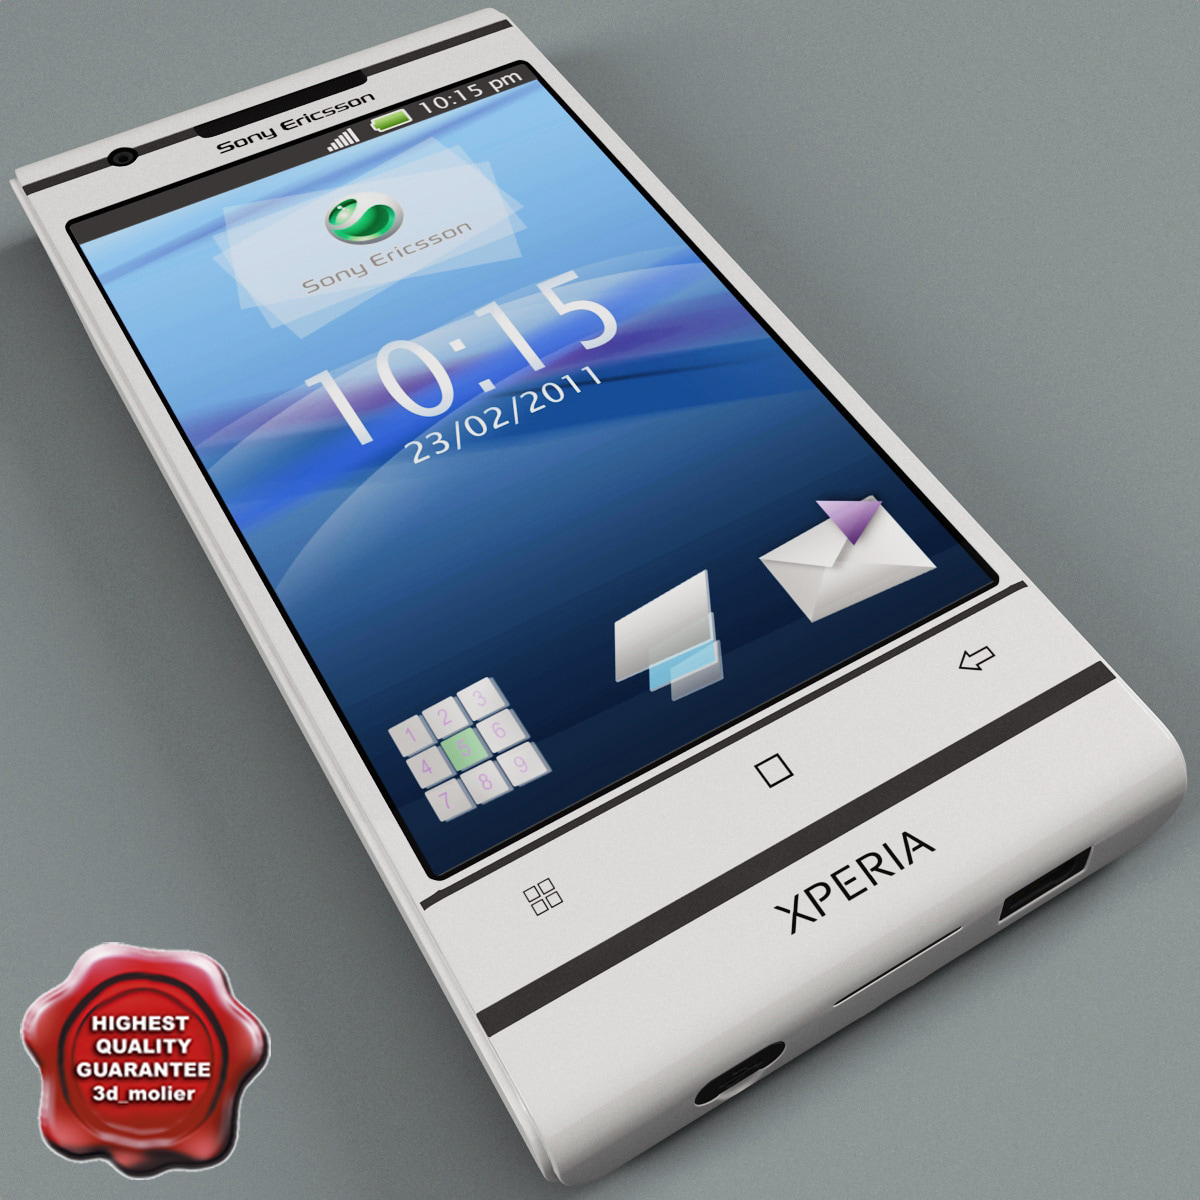 Sony_Ericsson_X12_Xperia_00.jpg